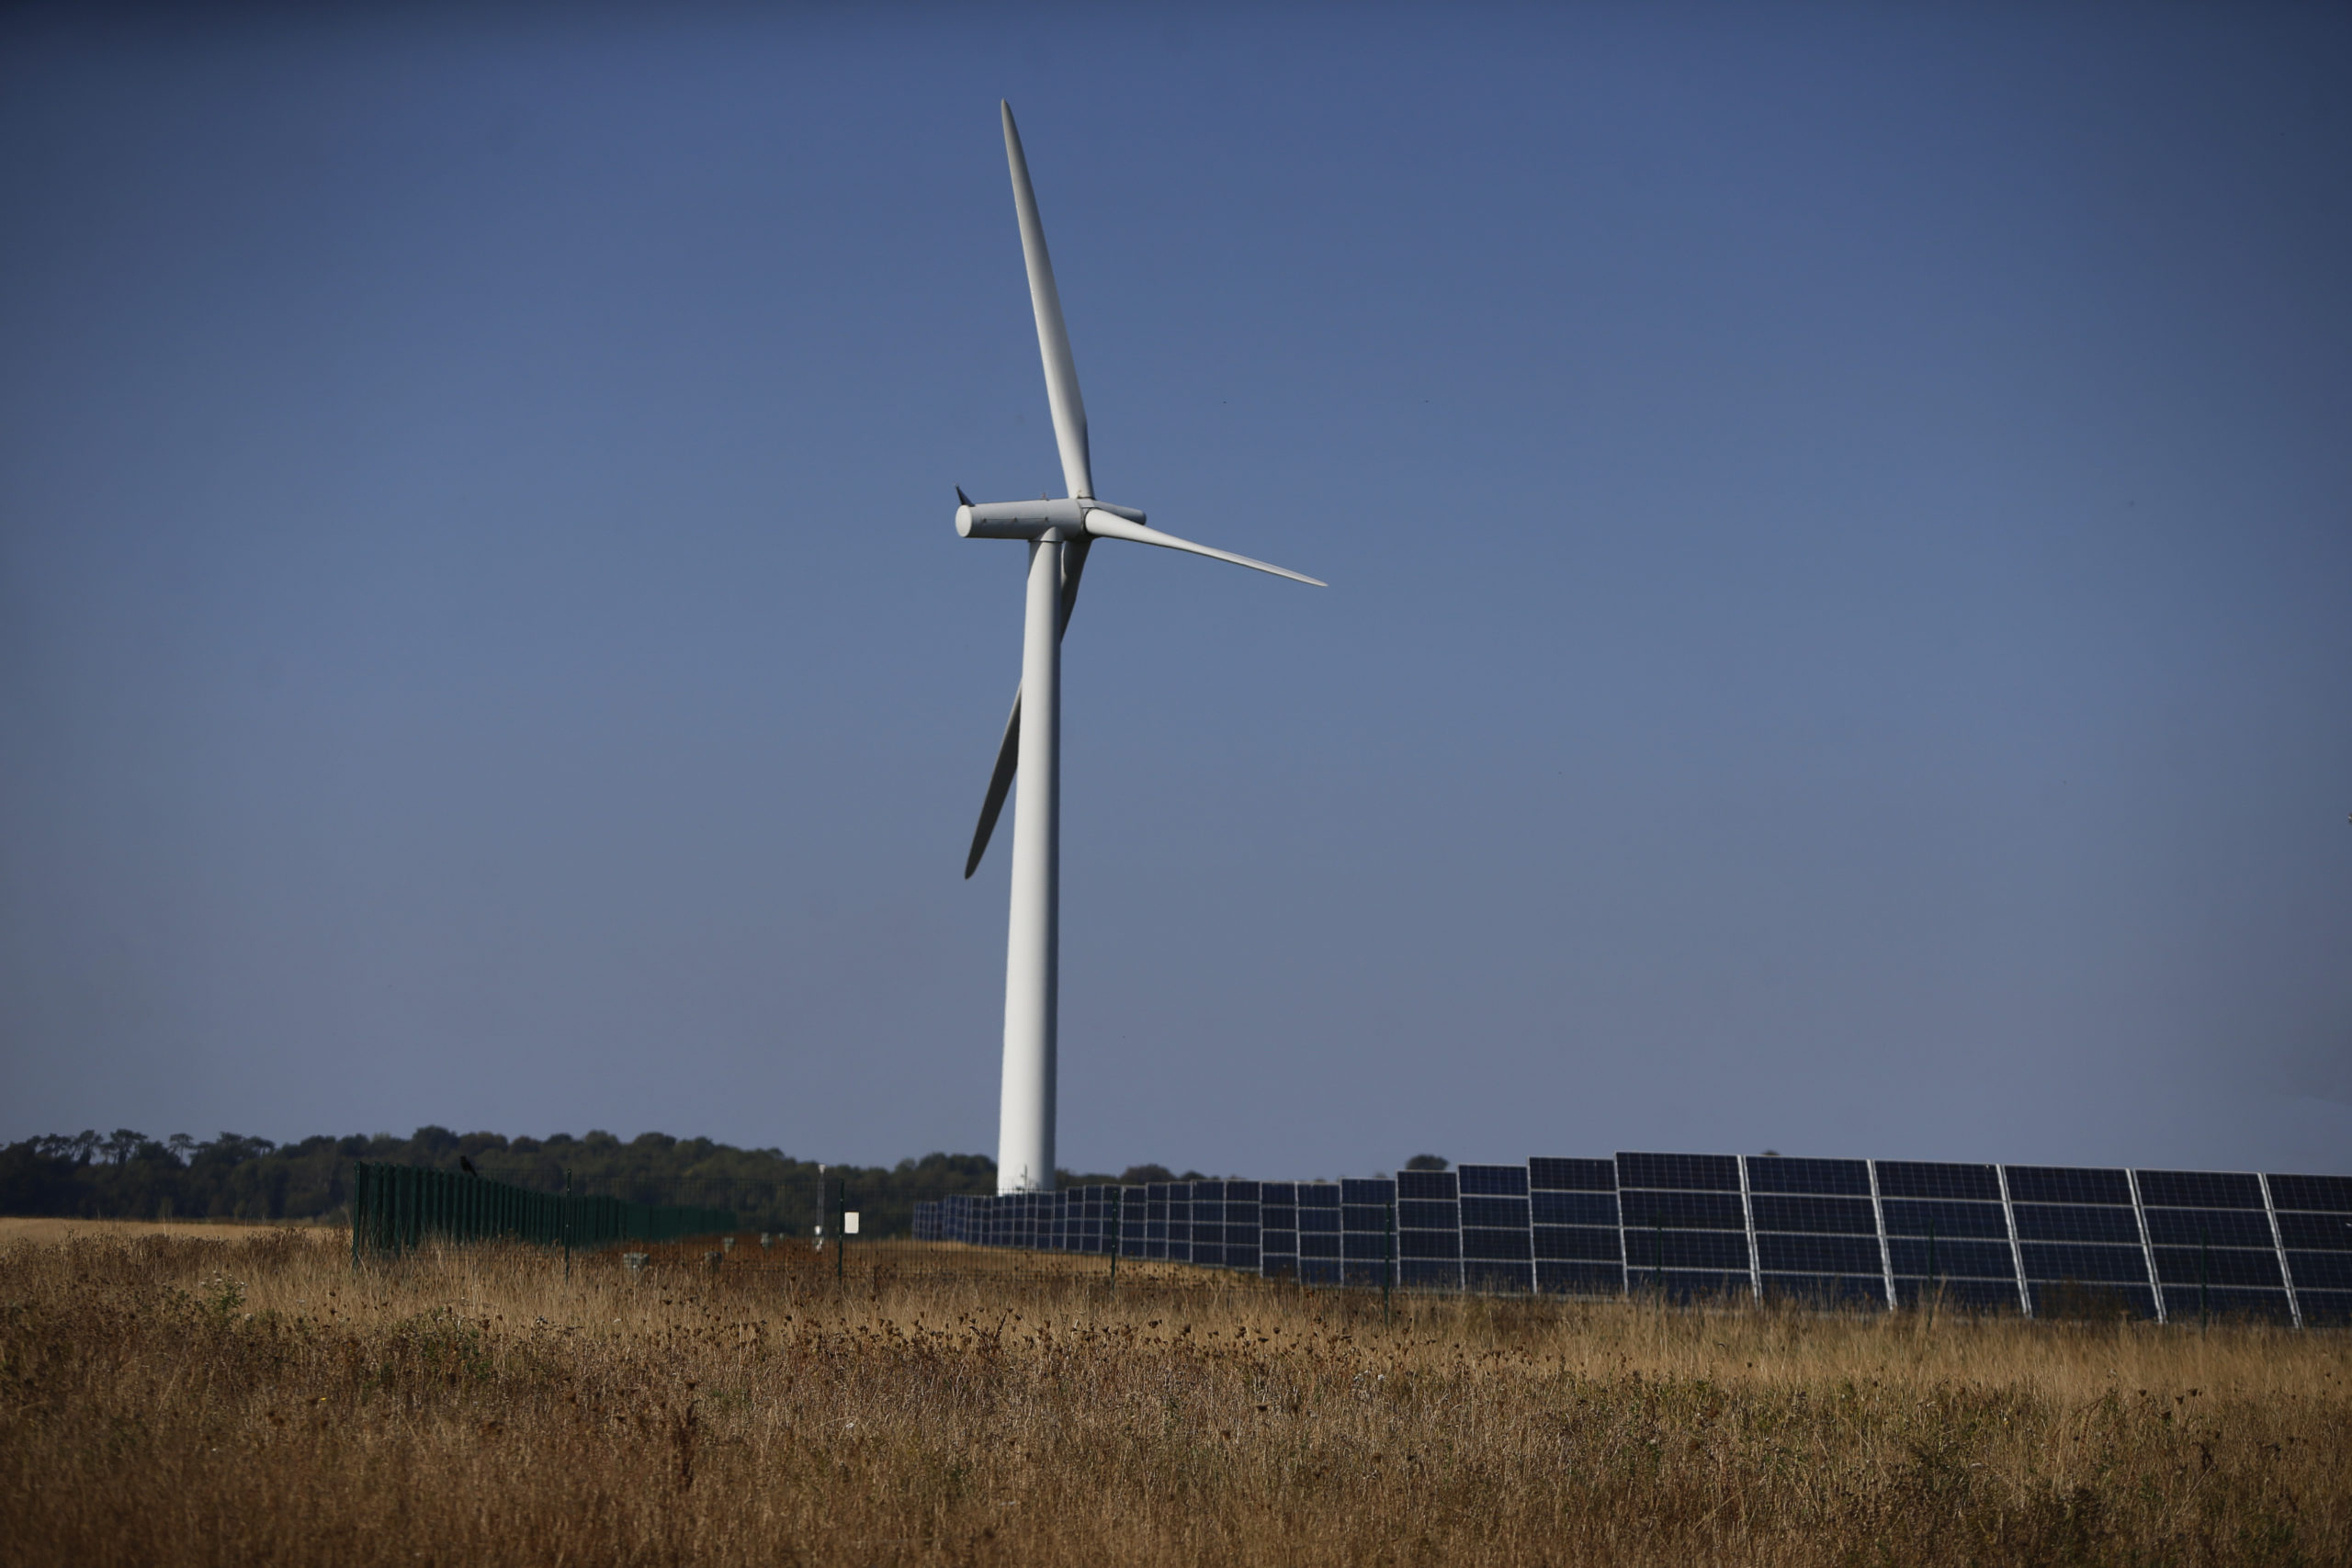 a windfarm and solar panels